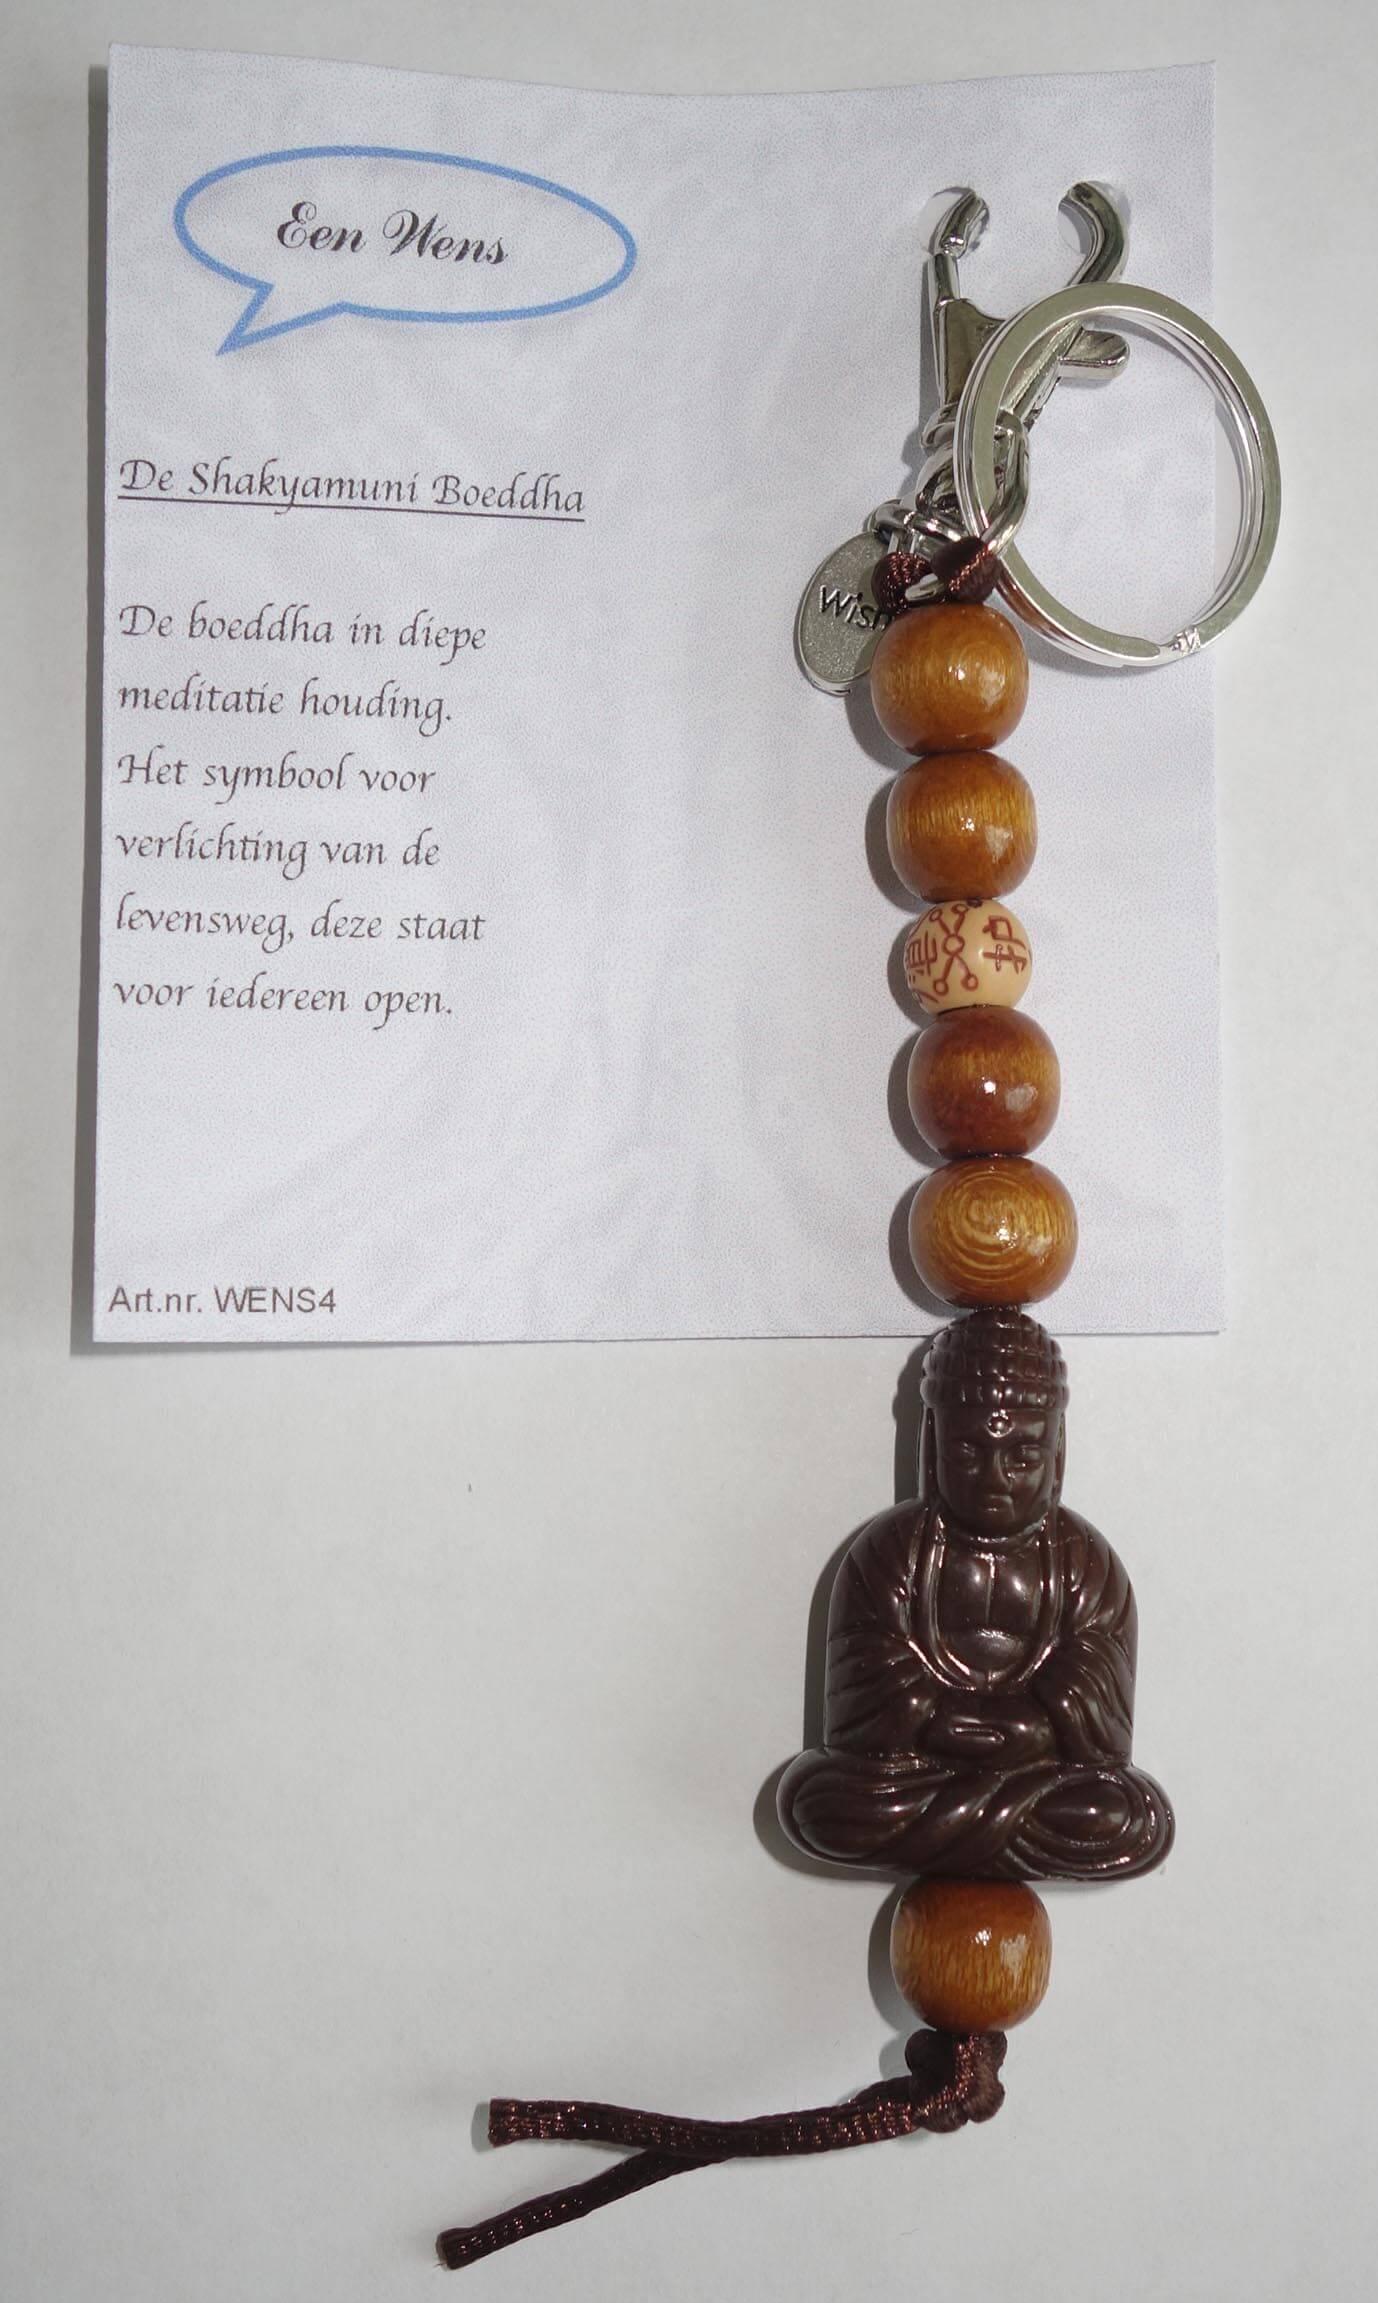 De Shakyamuni Boeddha Sleutelhanger Bruin-0